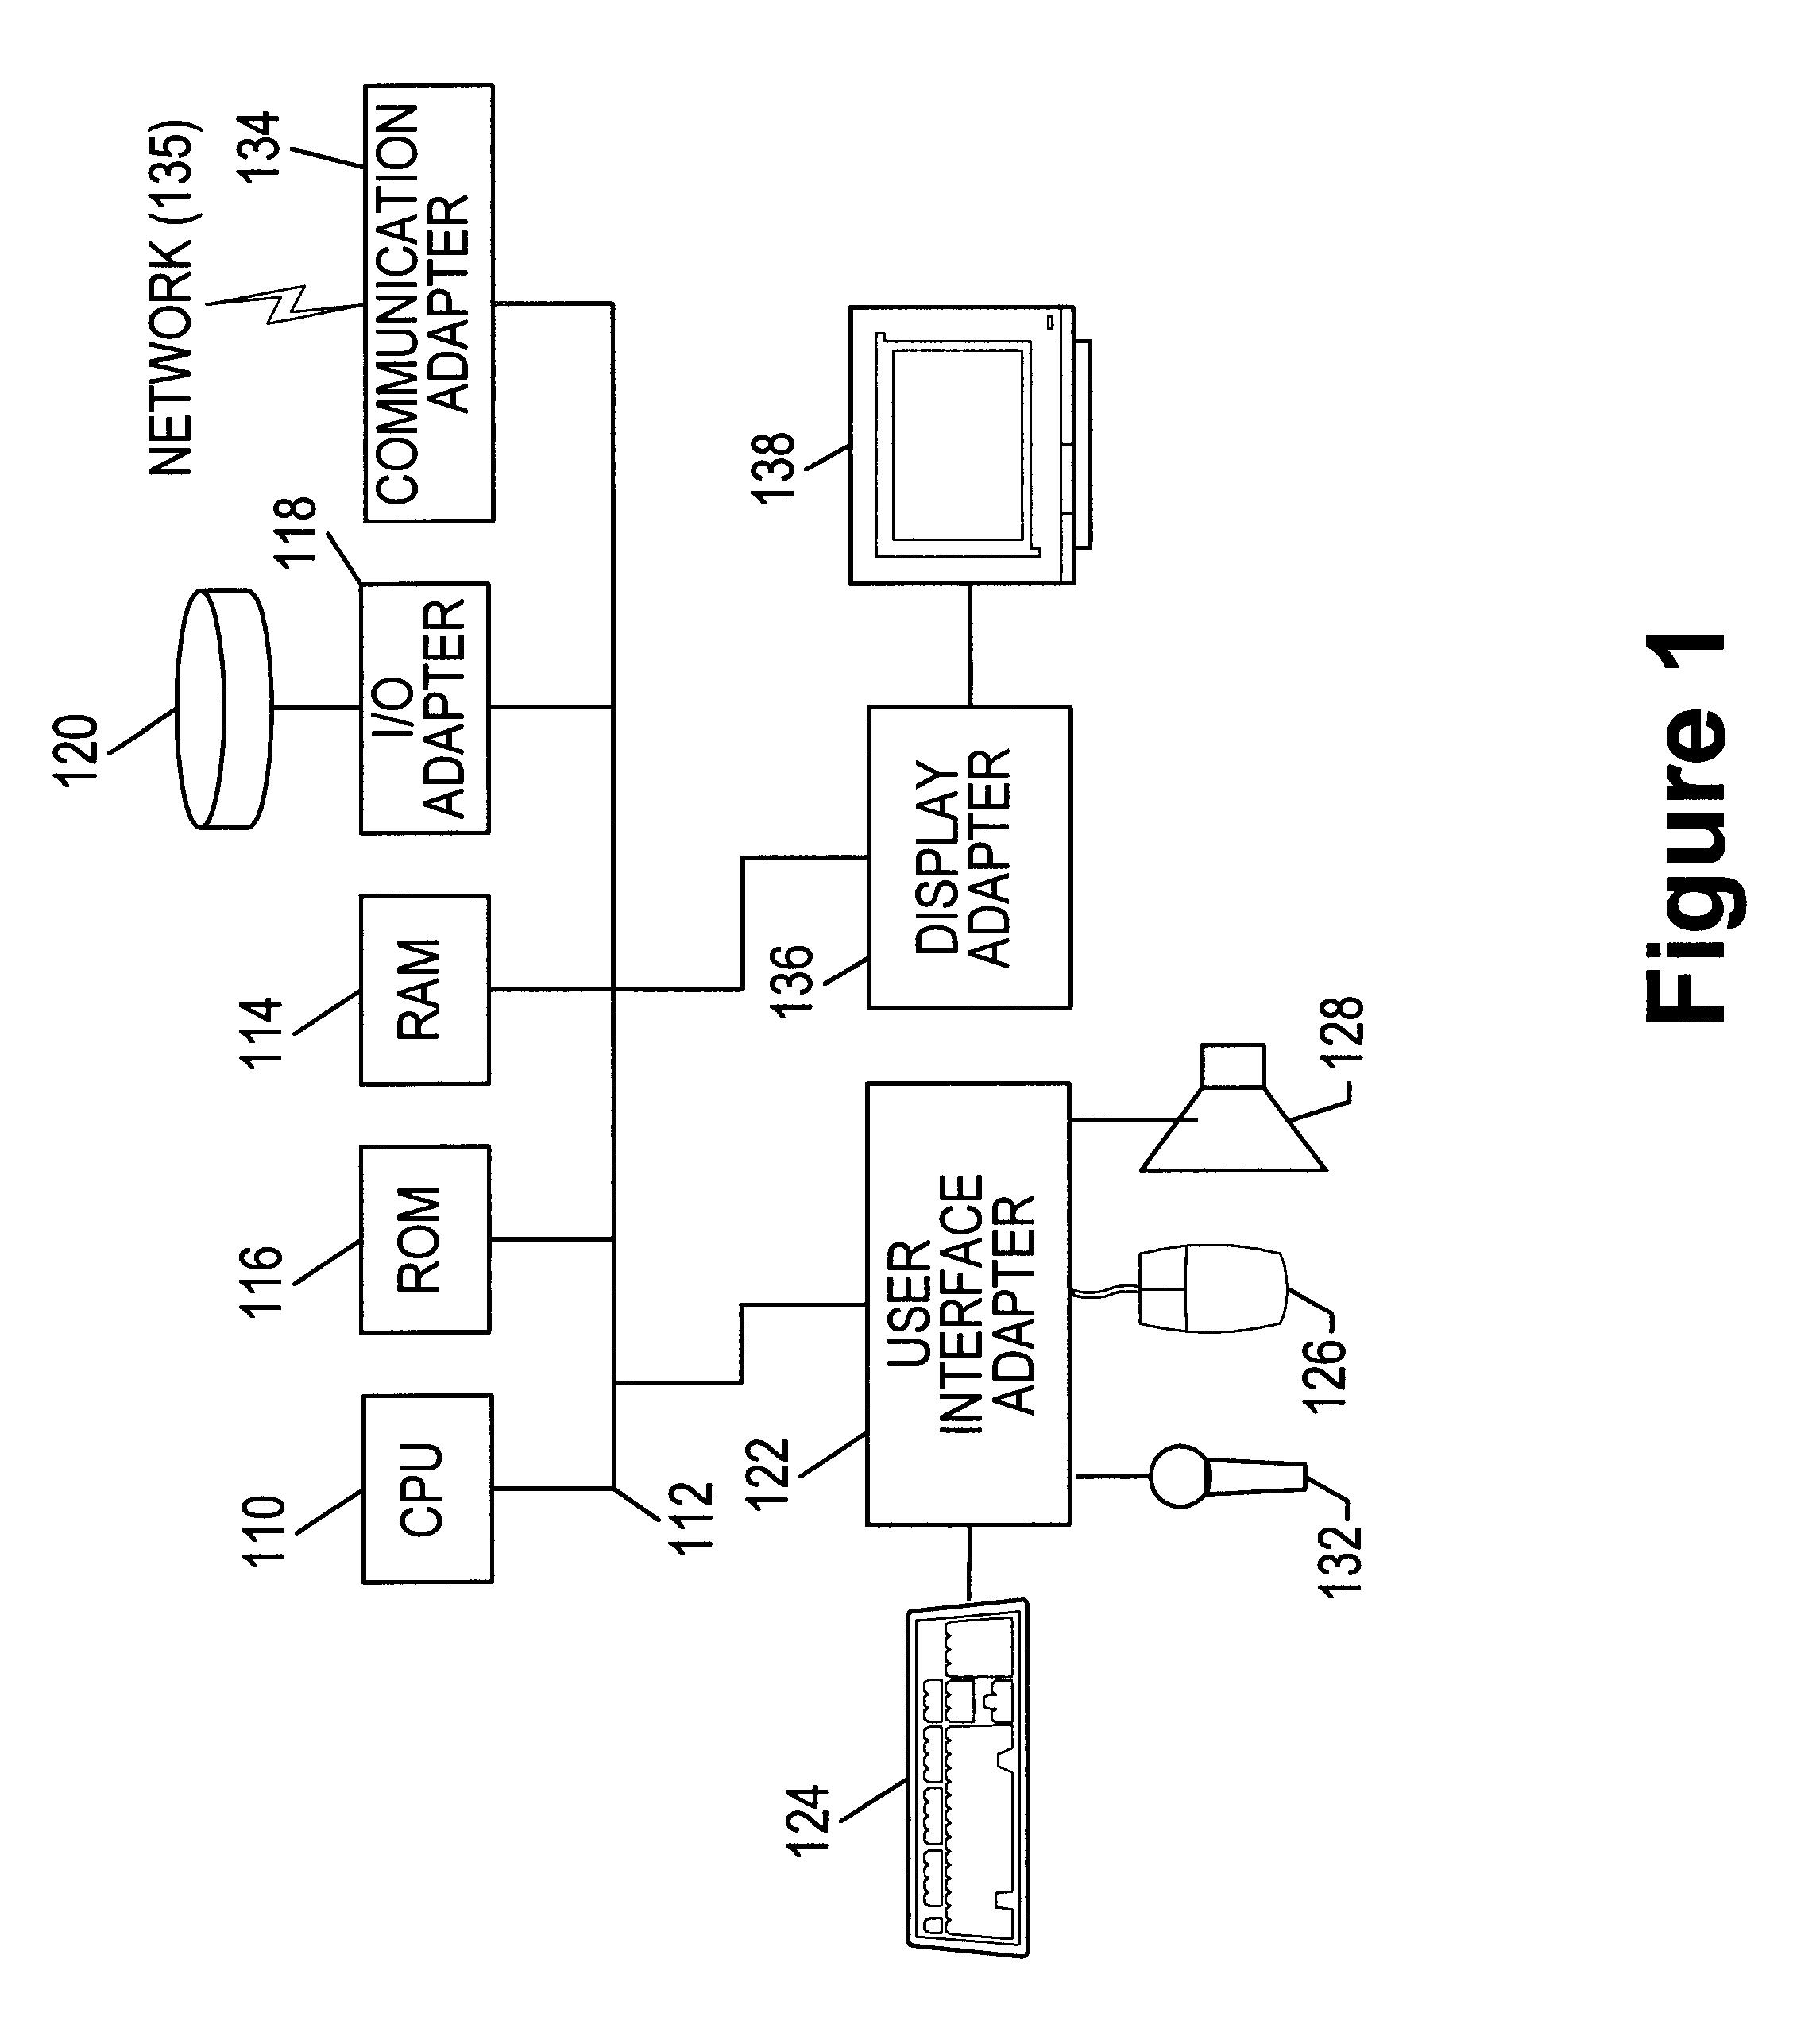 Patent Us 6289382 B1 2006 International 8600 Wiring Diagram Images